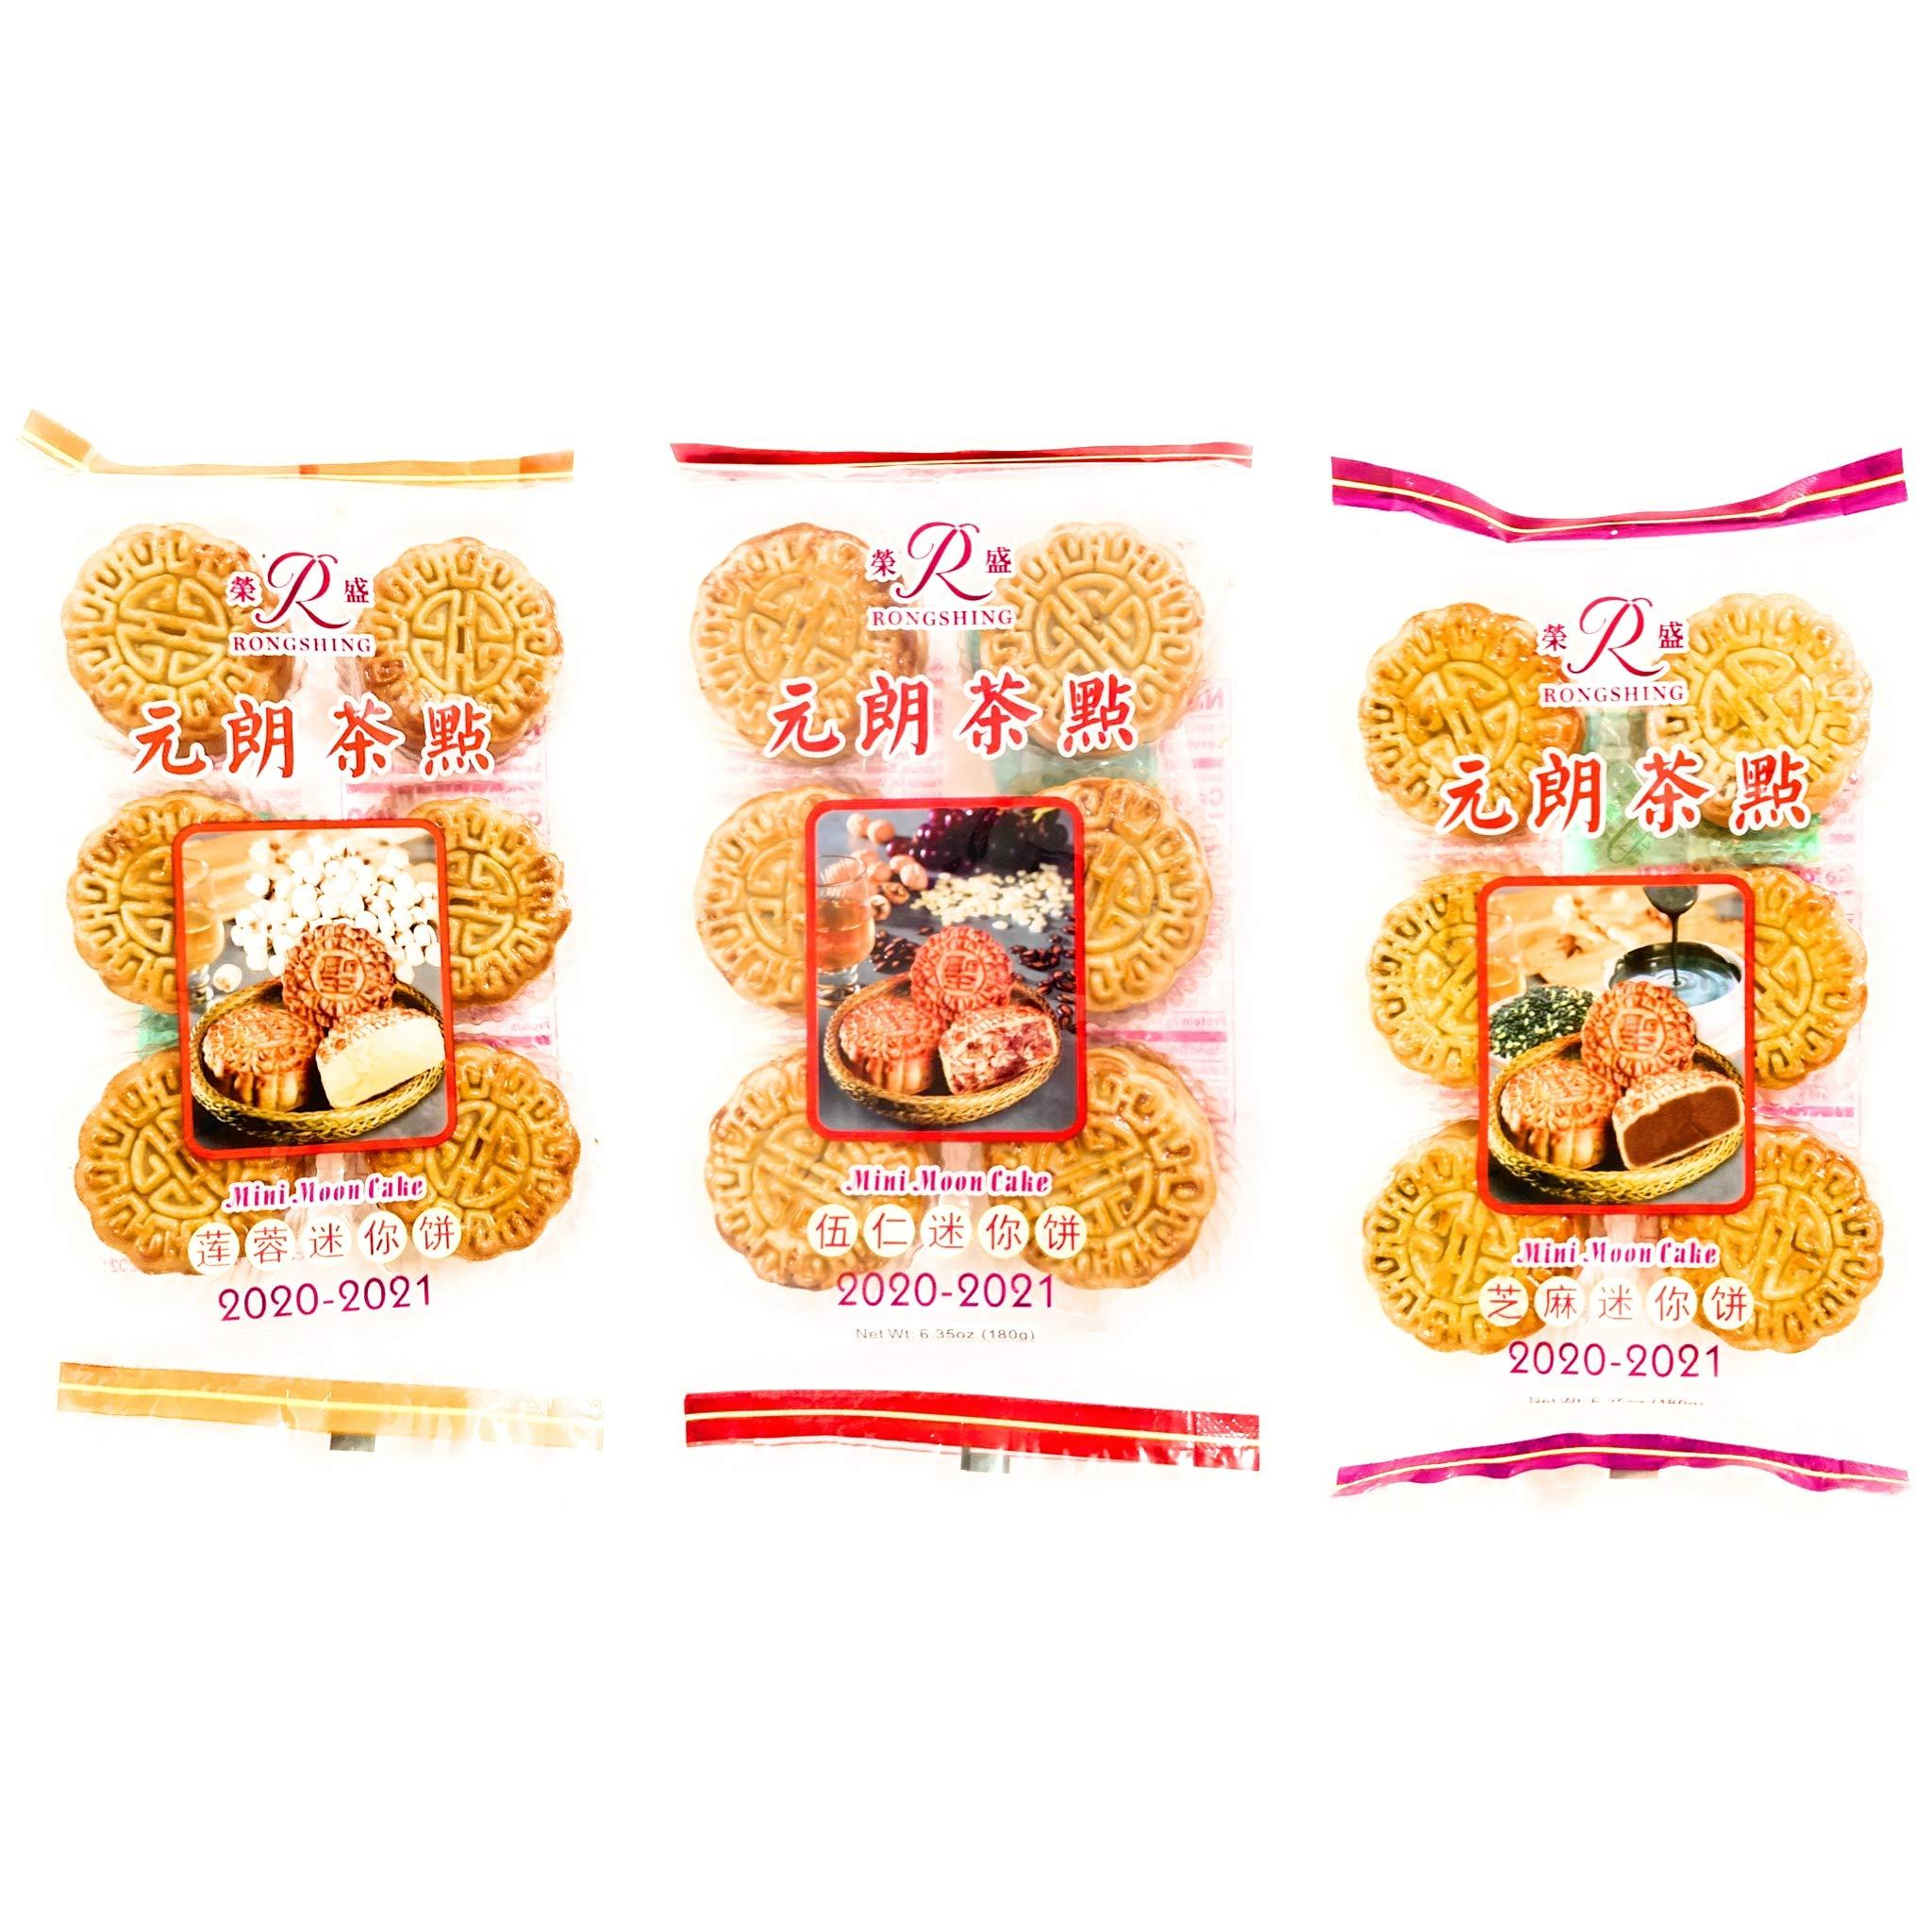 Rongshing Mini Moon Cake Combo (Five Nut.Lotus Seed Paste.Sesame)-2 Pack Each.6.35 Oz Each